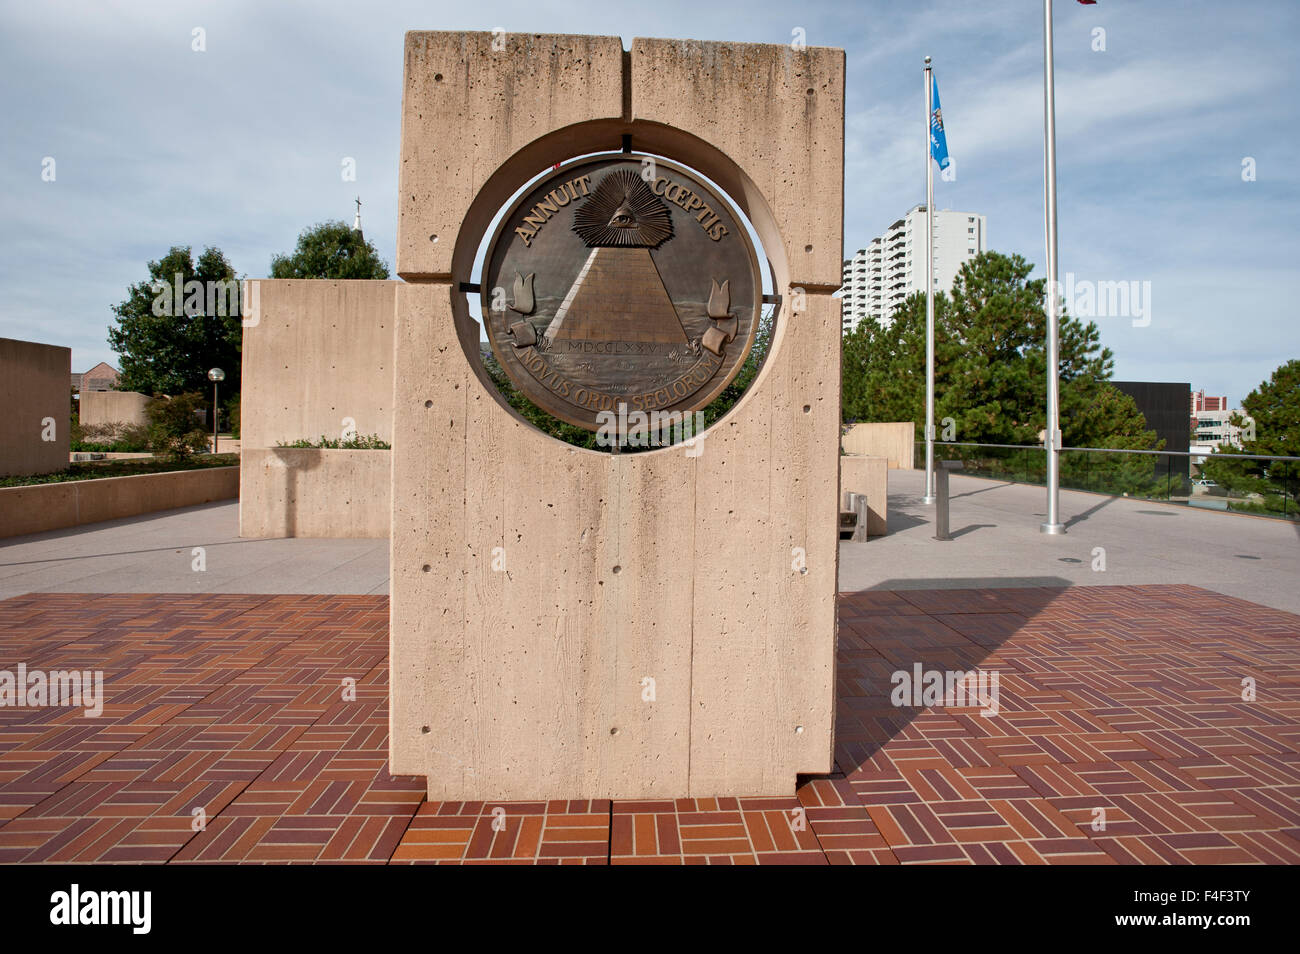 USA, Oklahoma, Oklahoma City, Alfred P. Murrah Federal Building Plaza and Memorial Overlook Informational Pedestal. Stock Photo